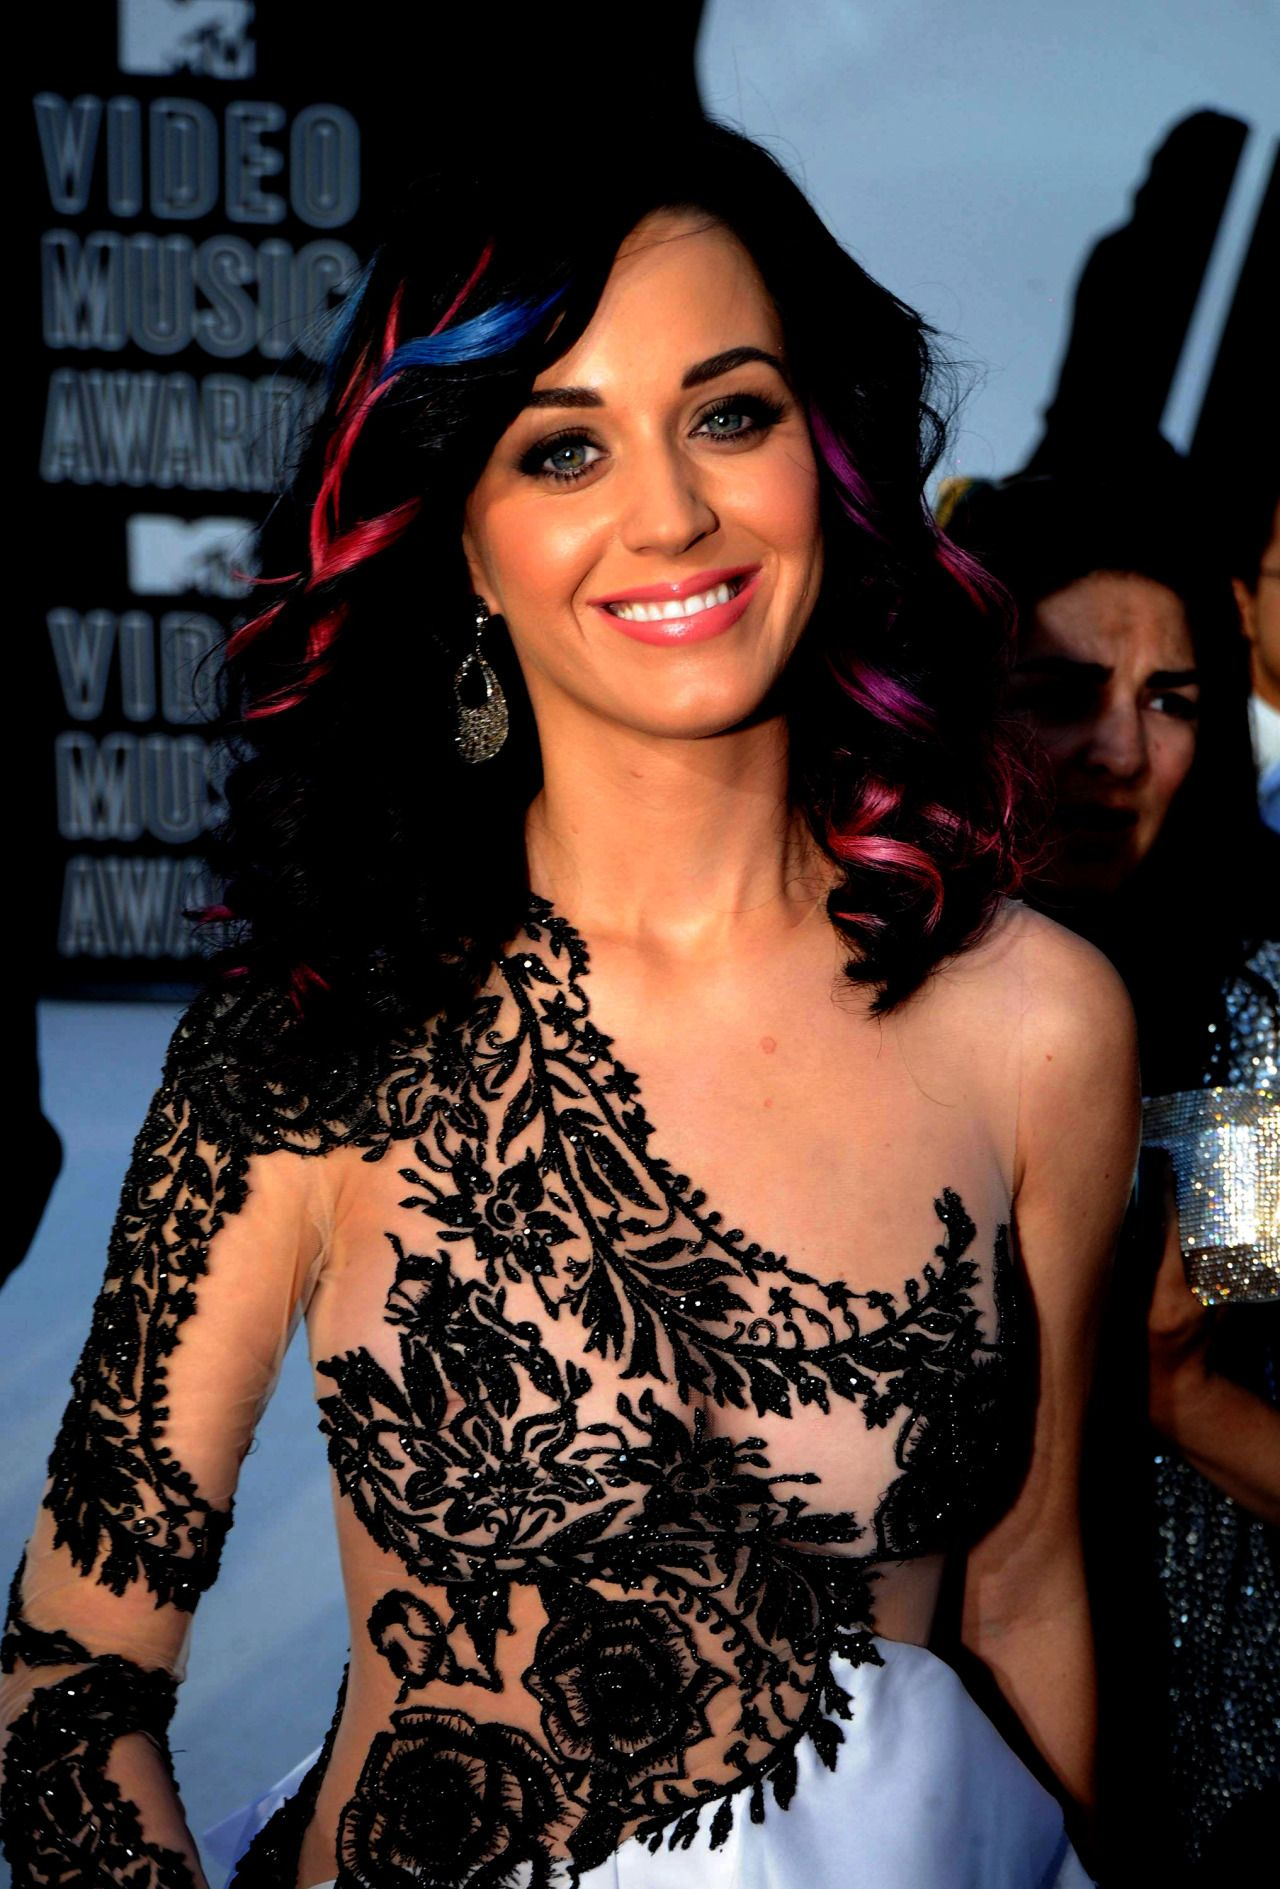 nudeandnaughtycelebs: Katy Perrys 2010 MTV VMAs nip